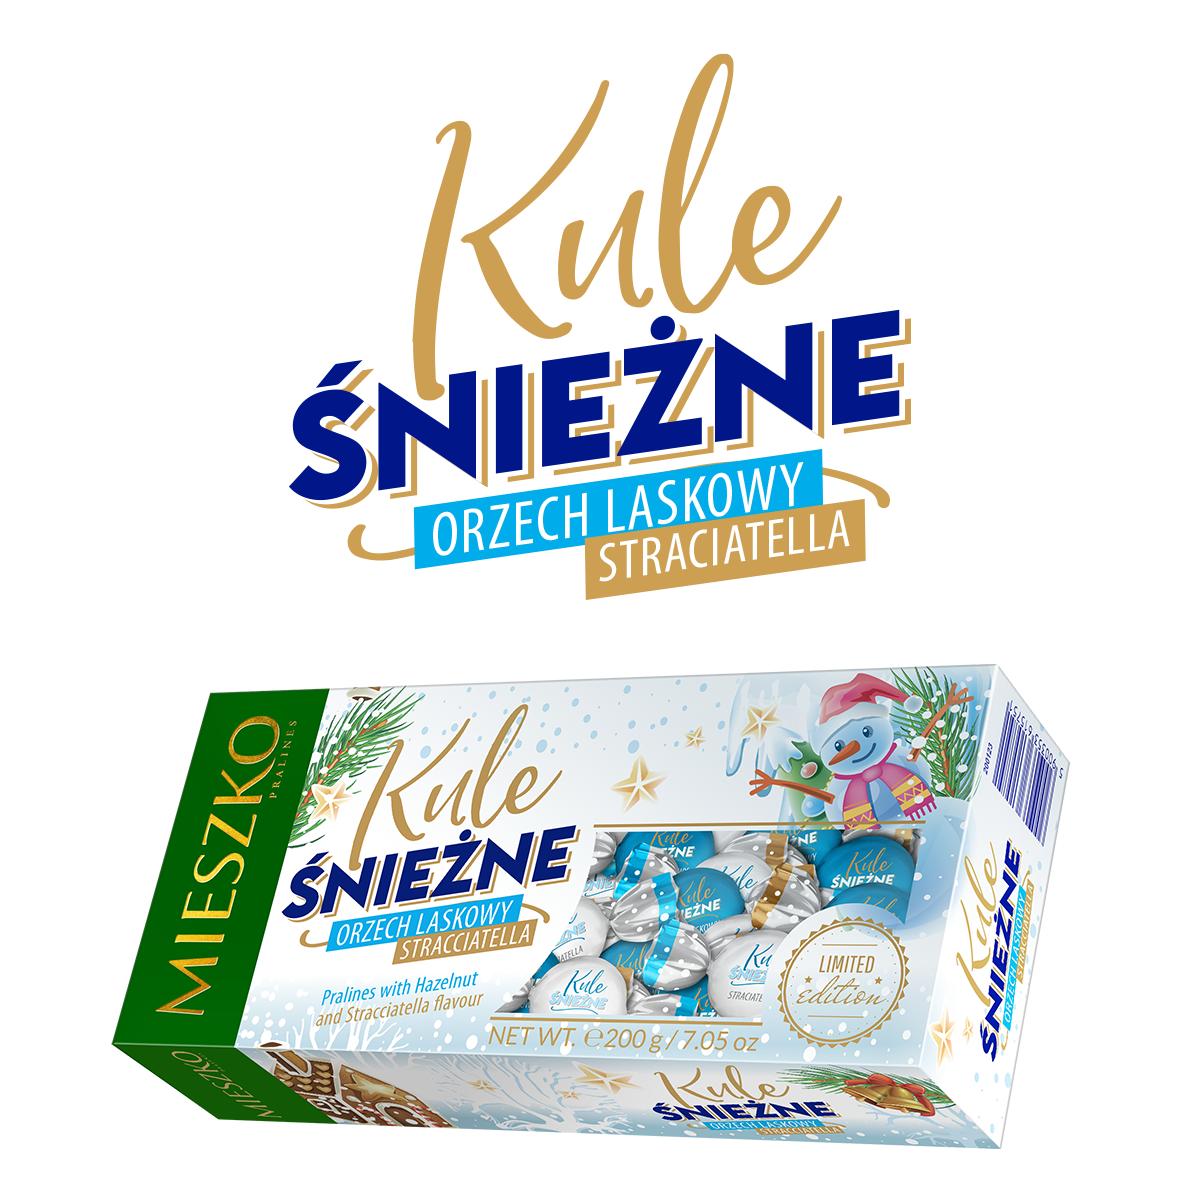 kule_sniezne_4